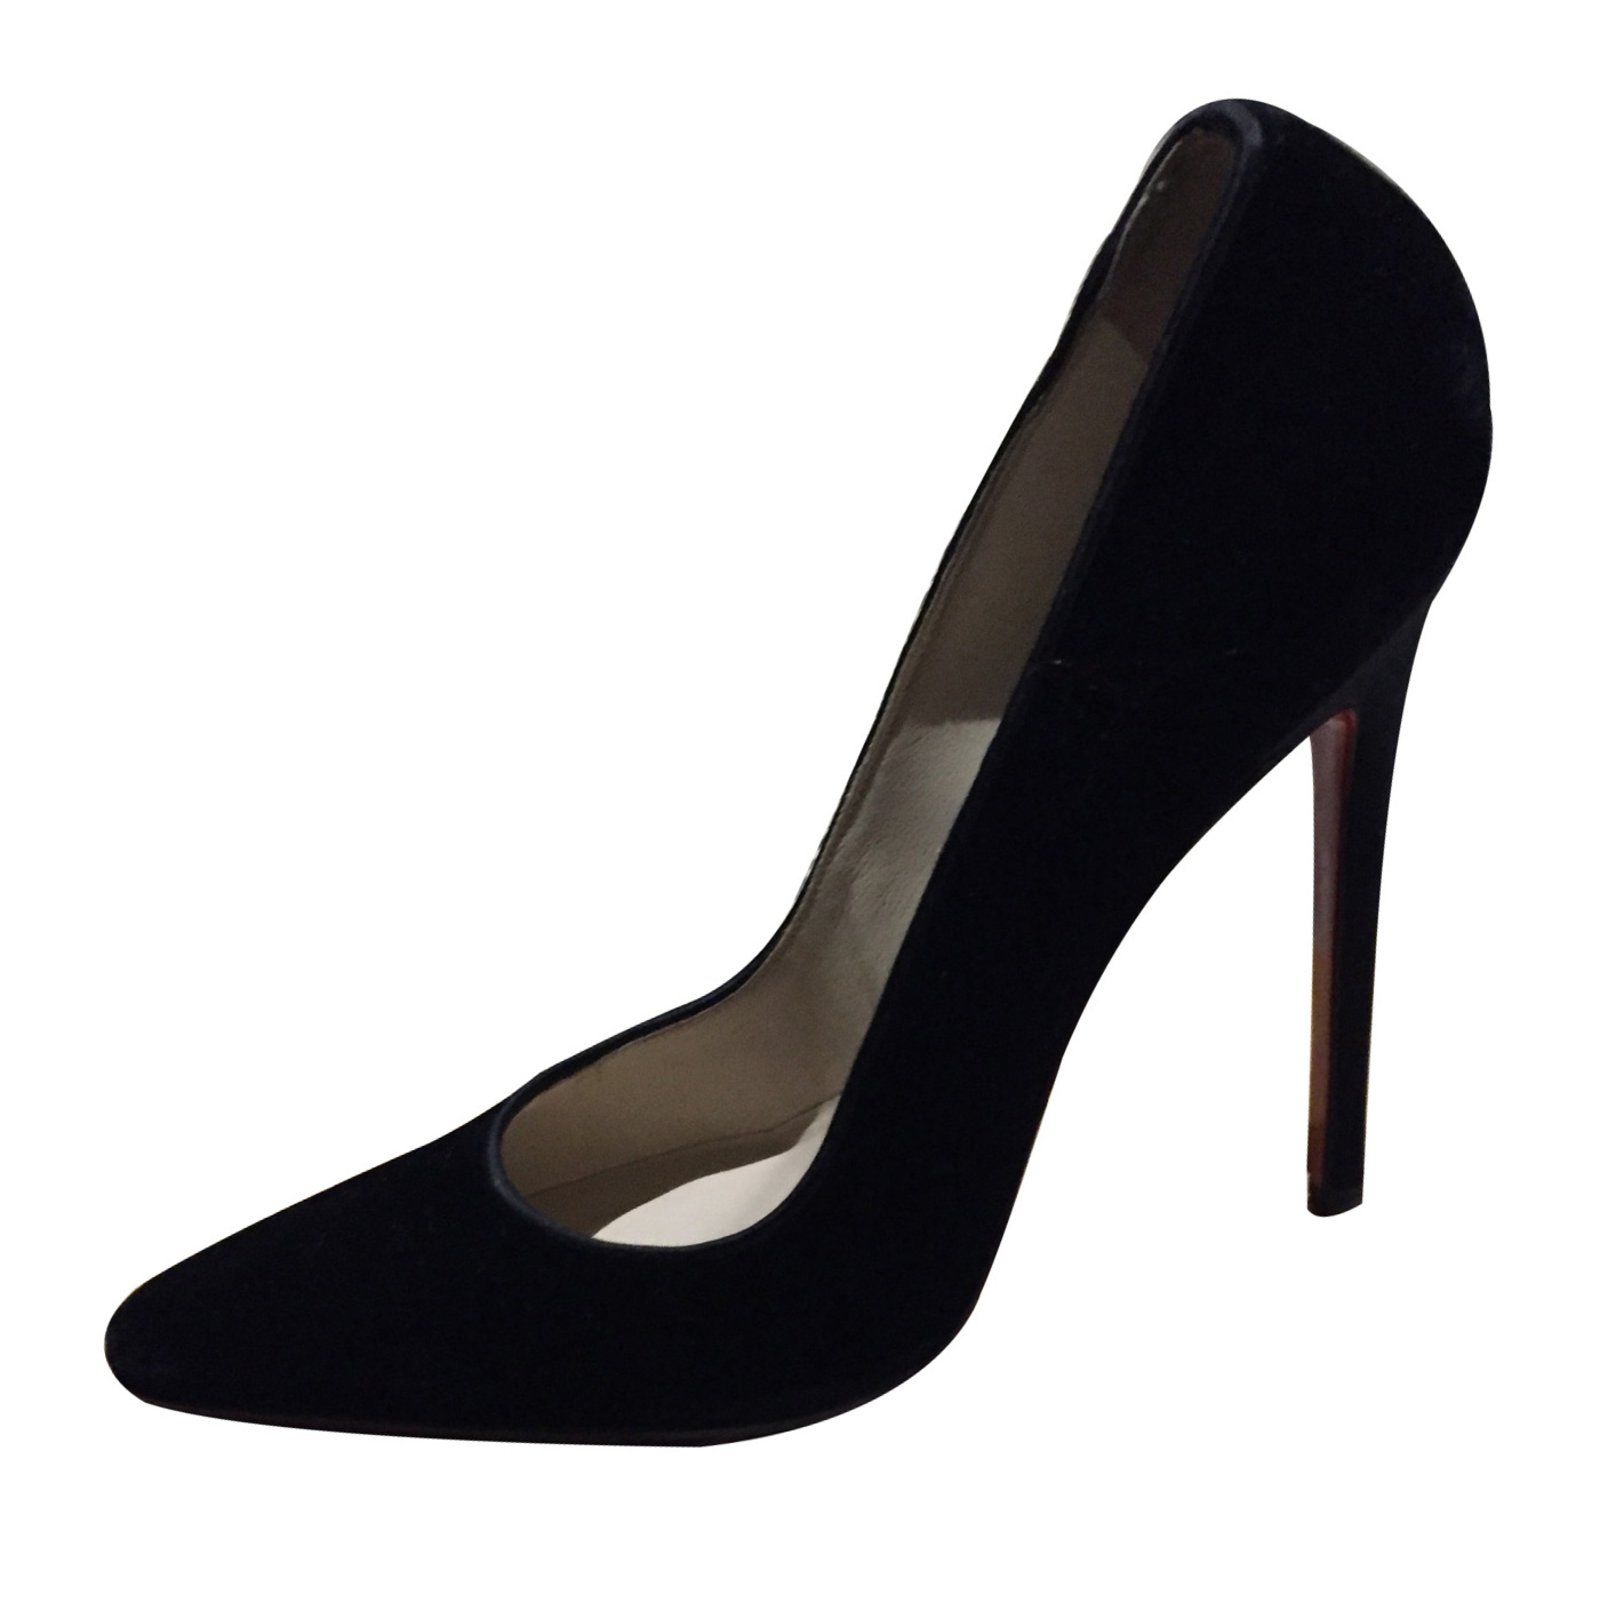 95e11f3faa59 Christian Louboutin Heels Heels Velvet Black ref.9794 - Joli Closet